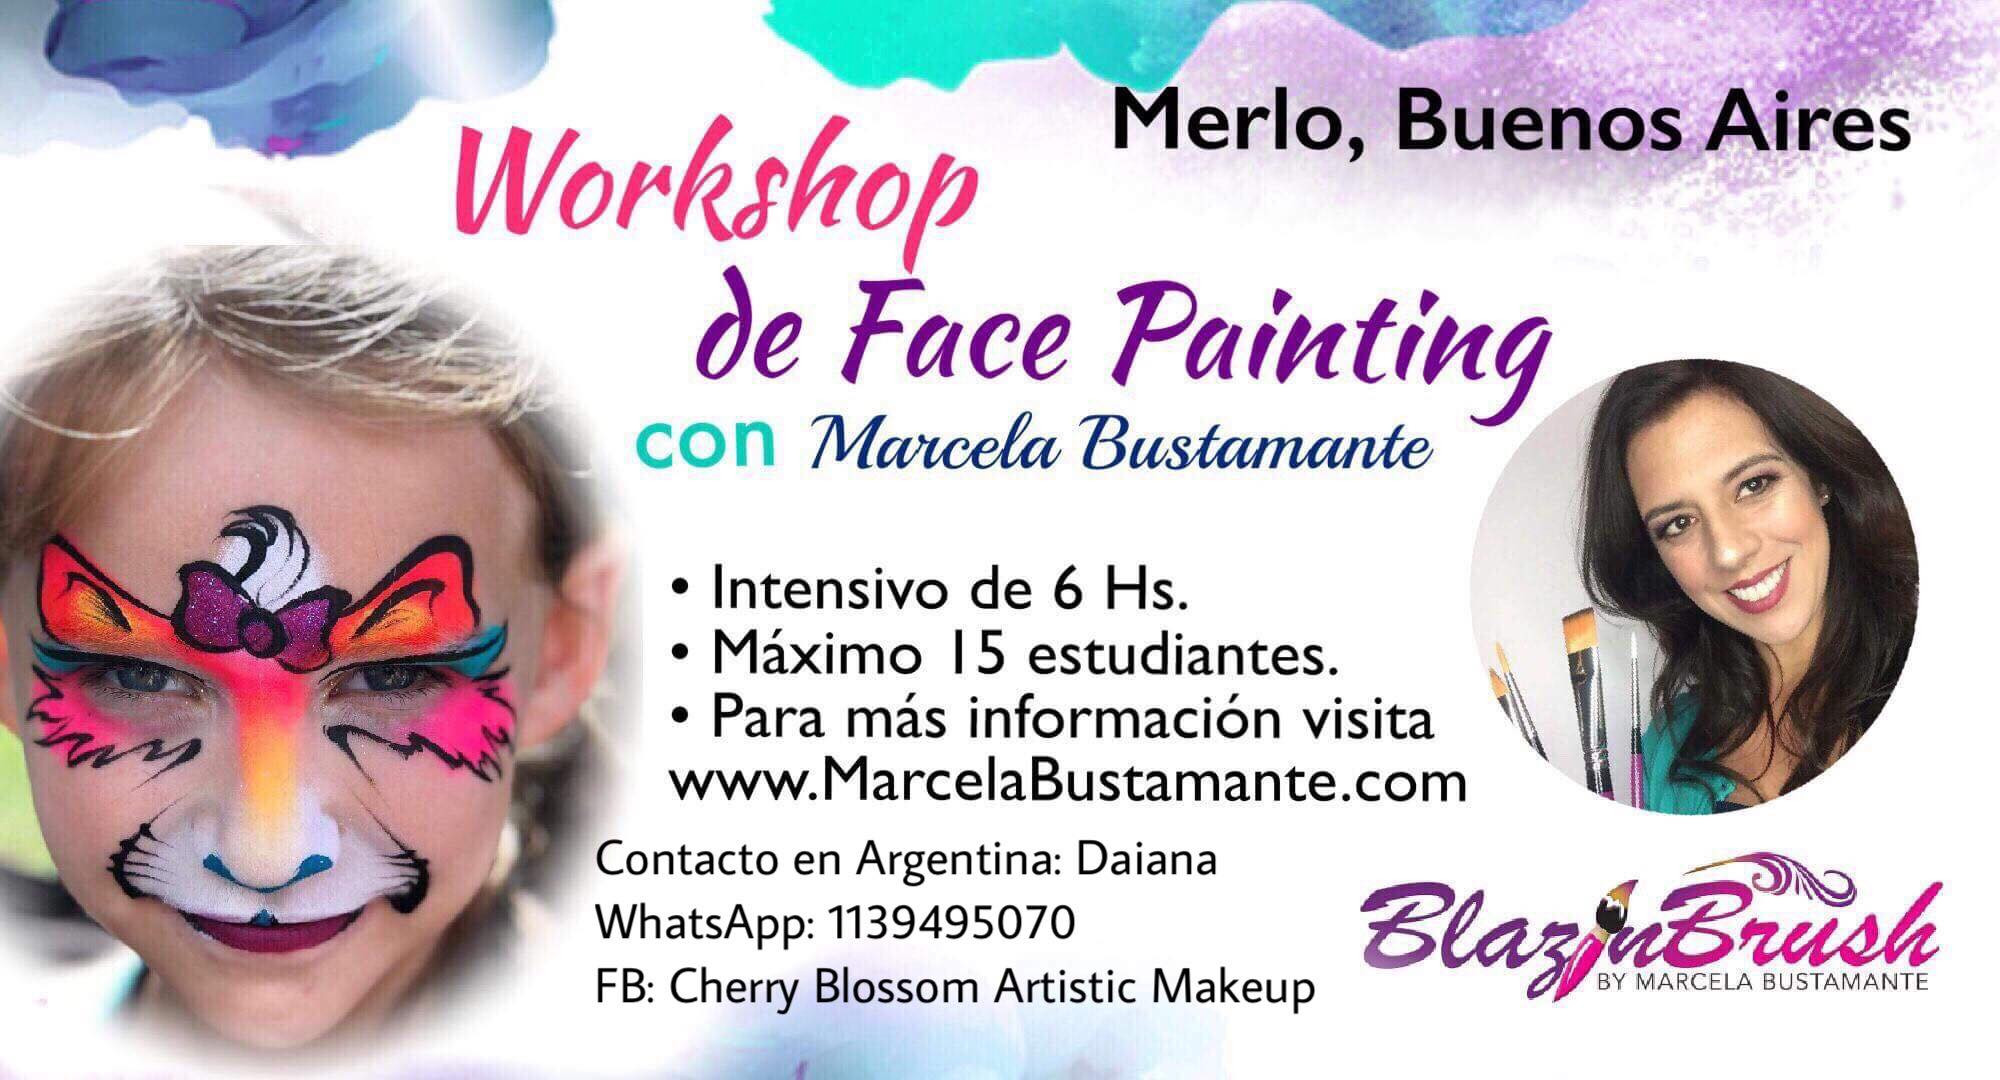 Face Painting workshop Merlo, Argentina